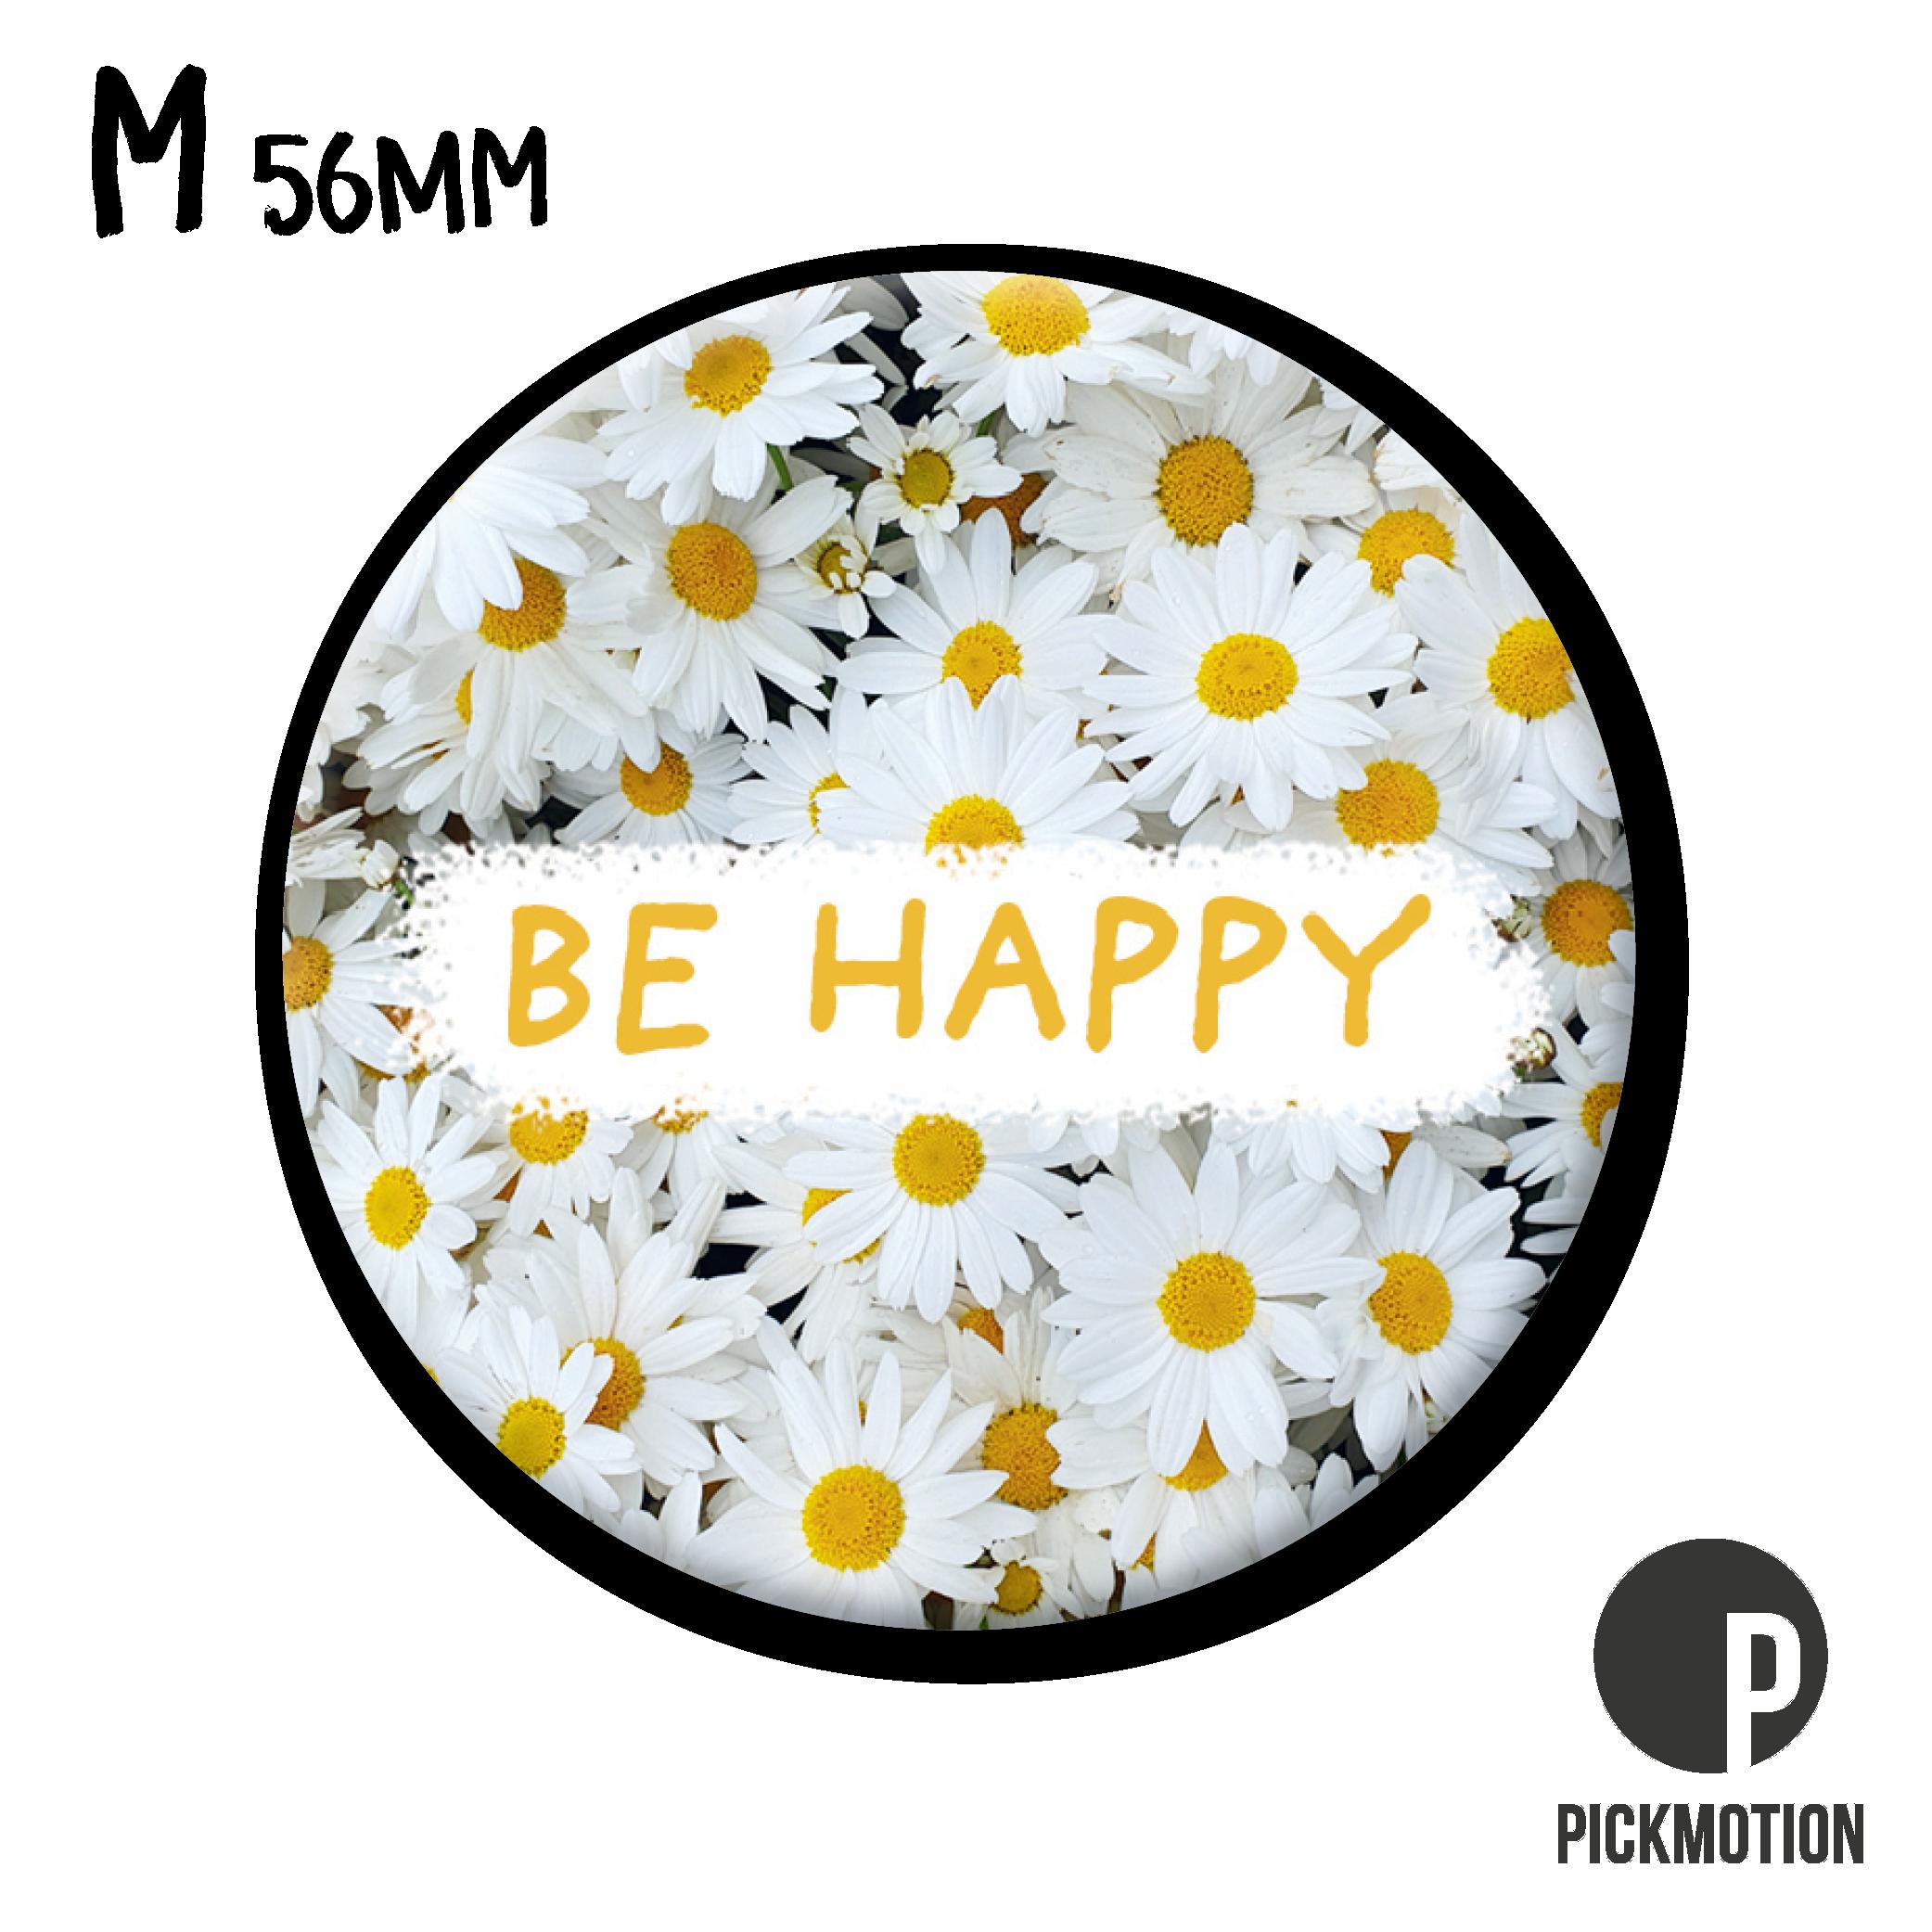 "Kühlschrank-Magnet - Medium - Be happy"" - MM 0868-EN - Pickmotion"